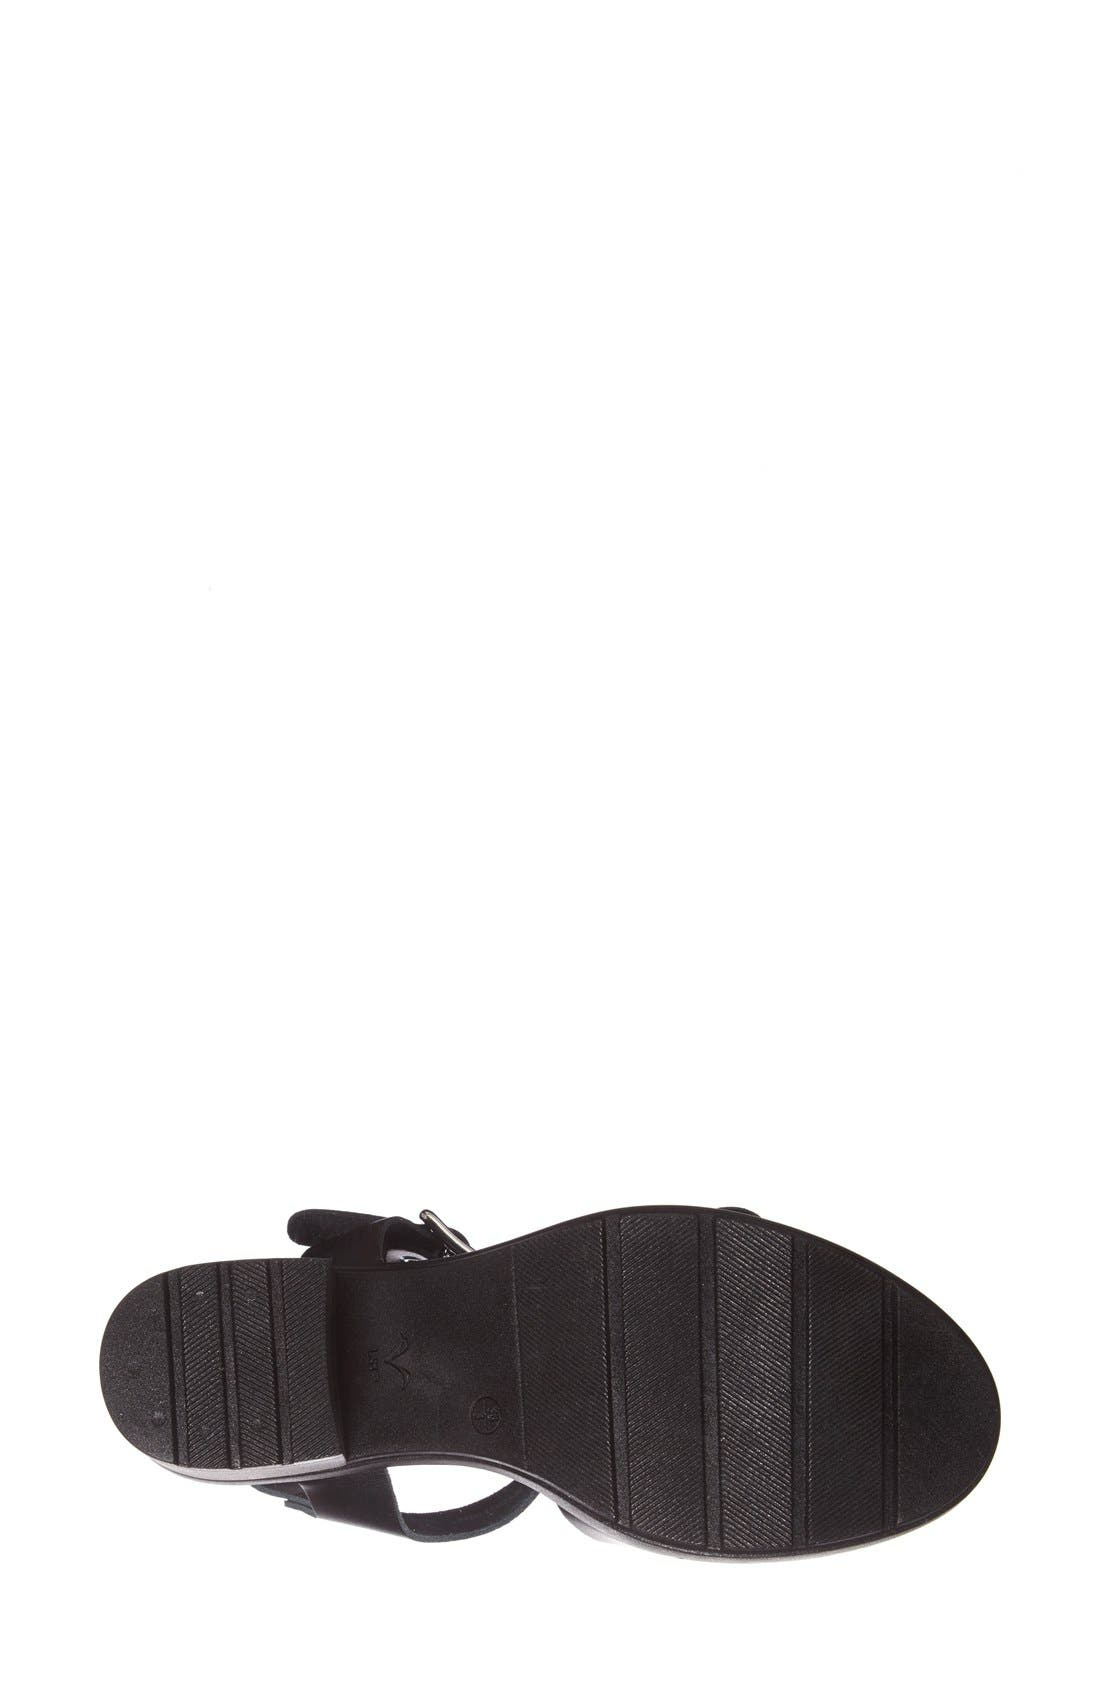 Alternate Image 4  - Topshop 'Niece' Platform Leather Sandal (Women)